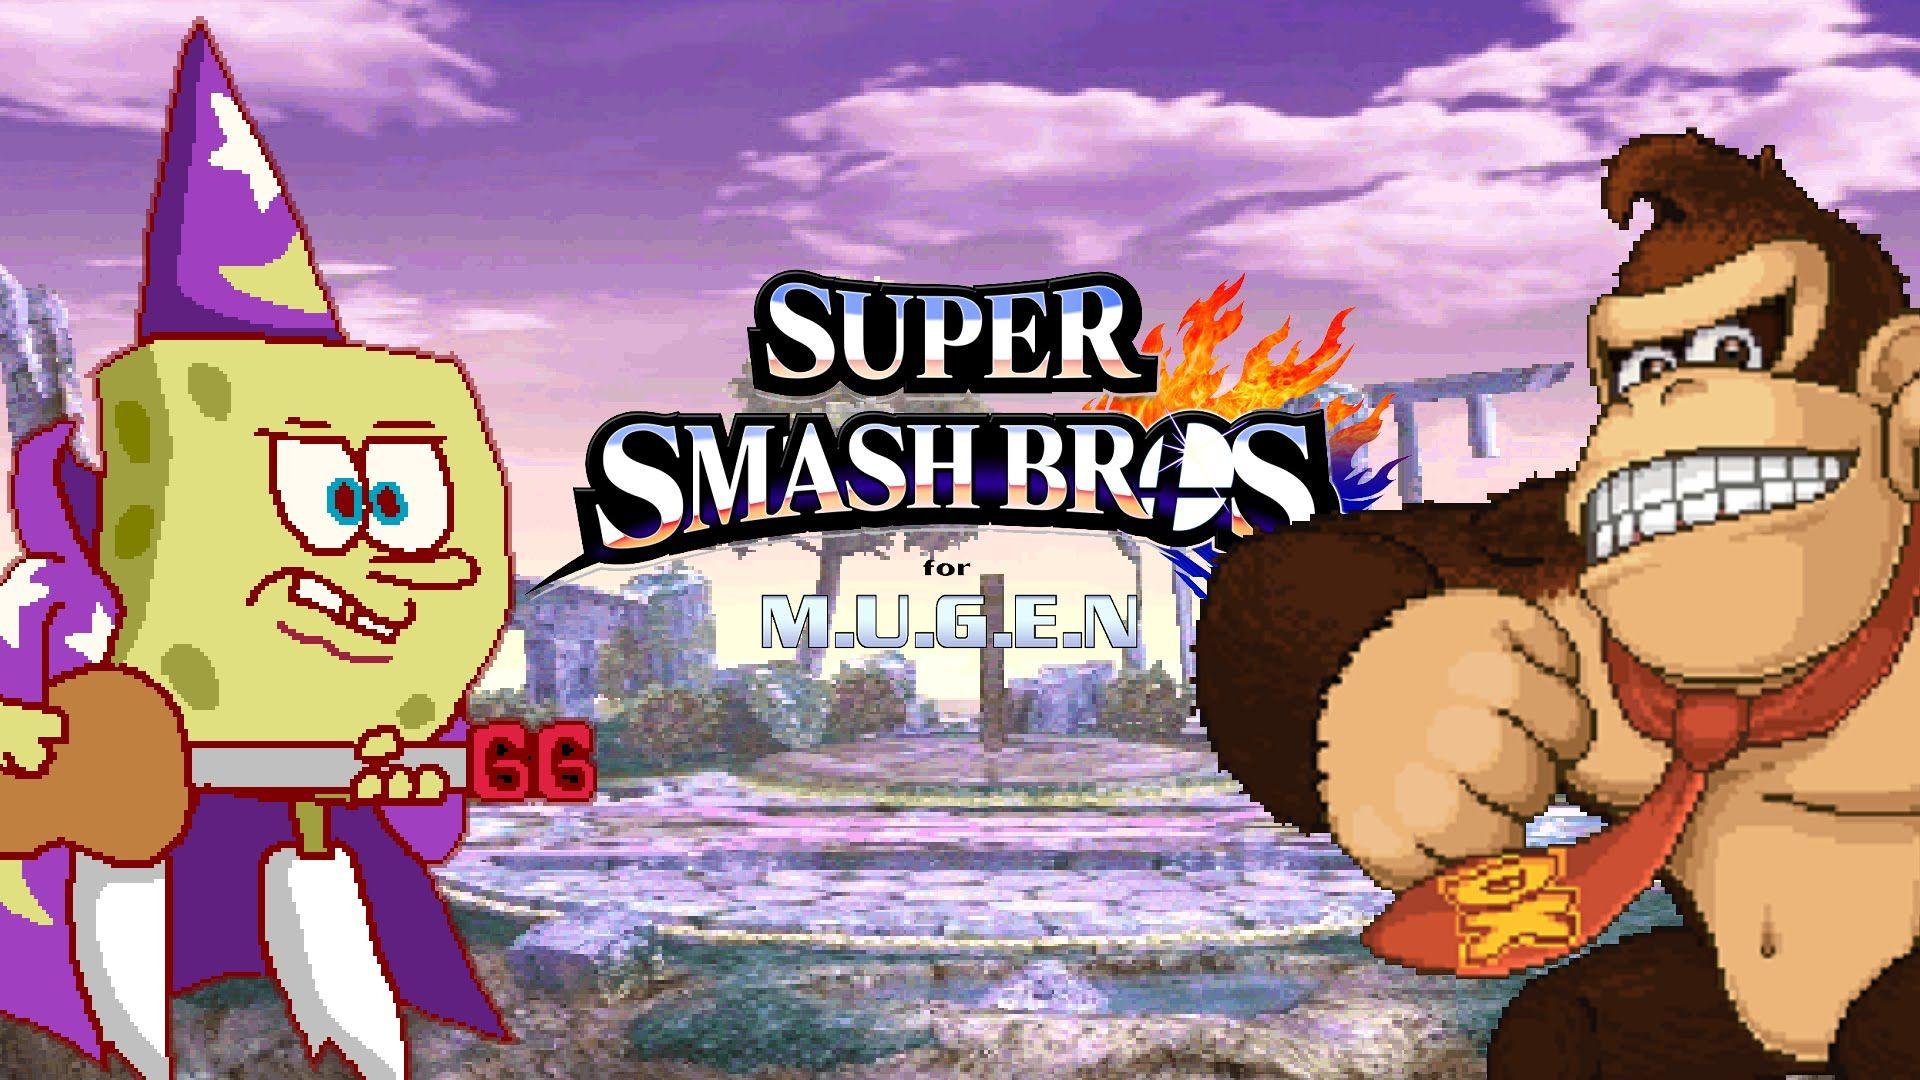 Super Smash Bros  Spongebob VS Donkey Kong MUGEN Ver  任天堂